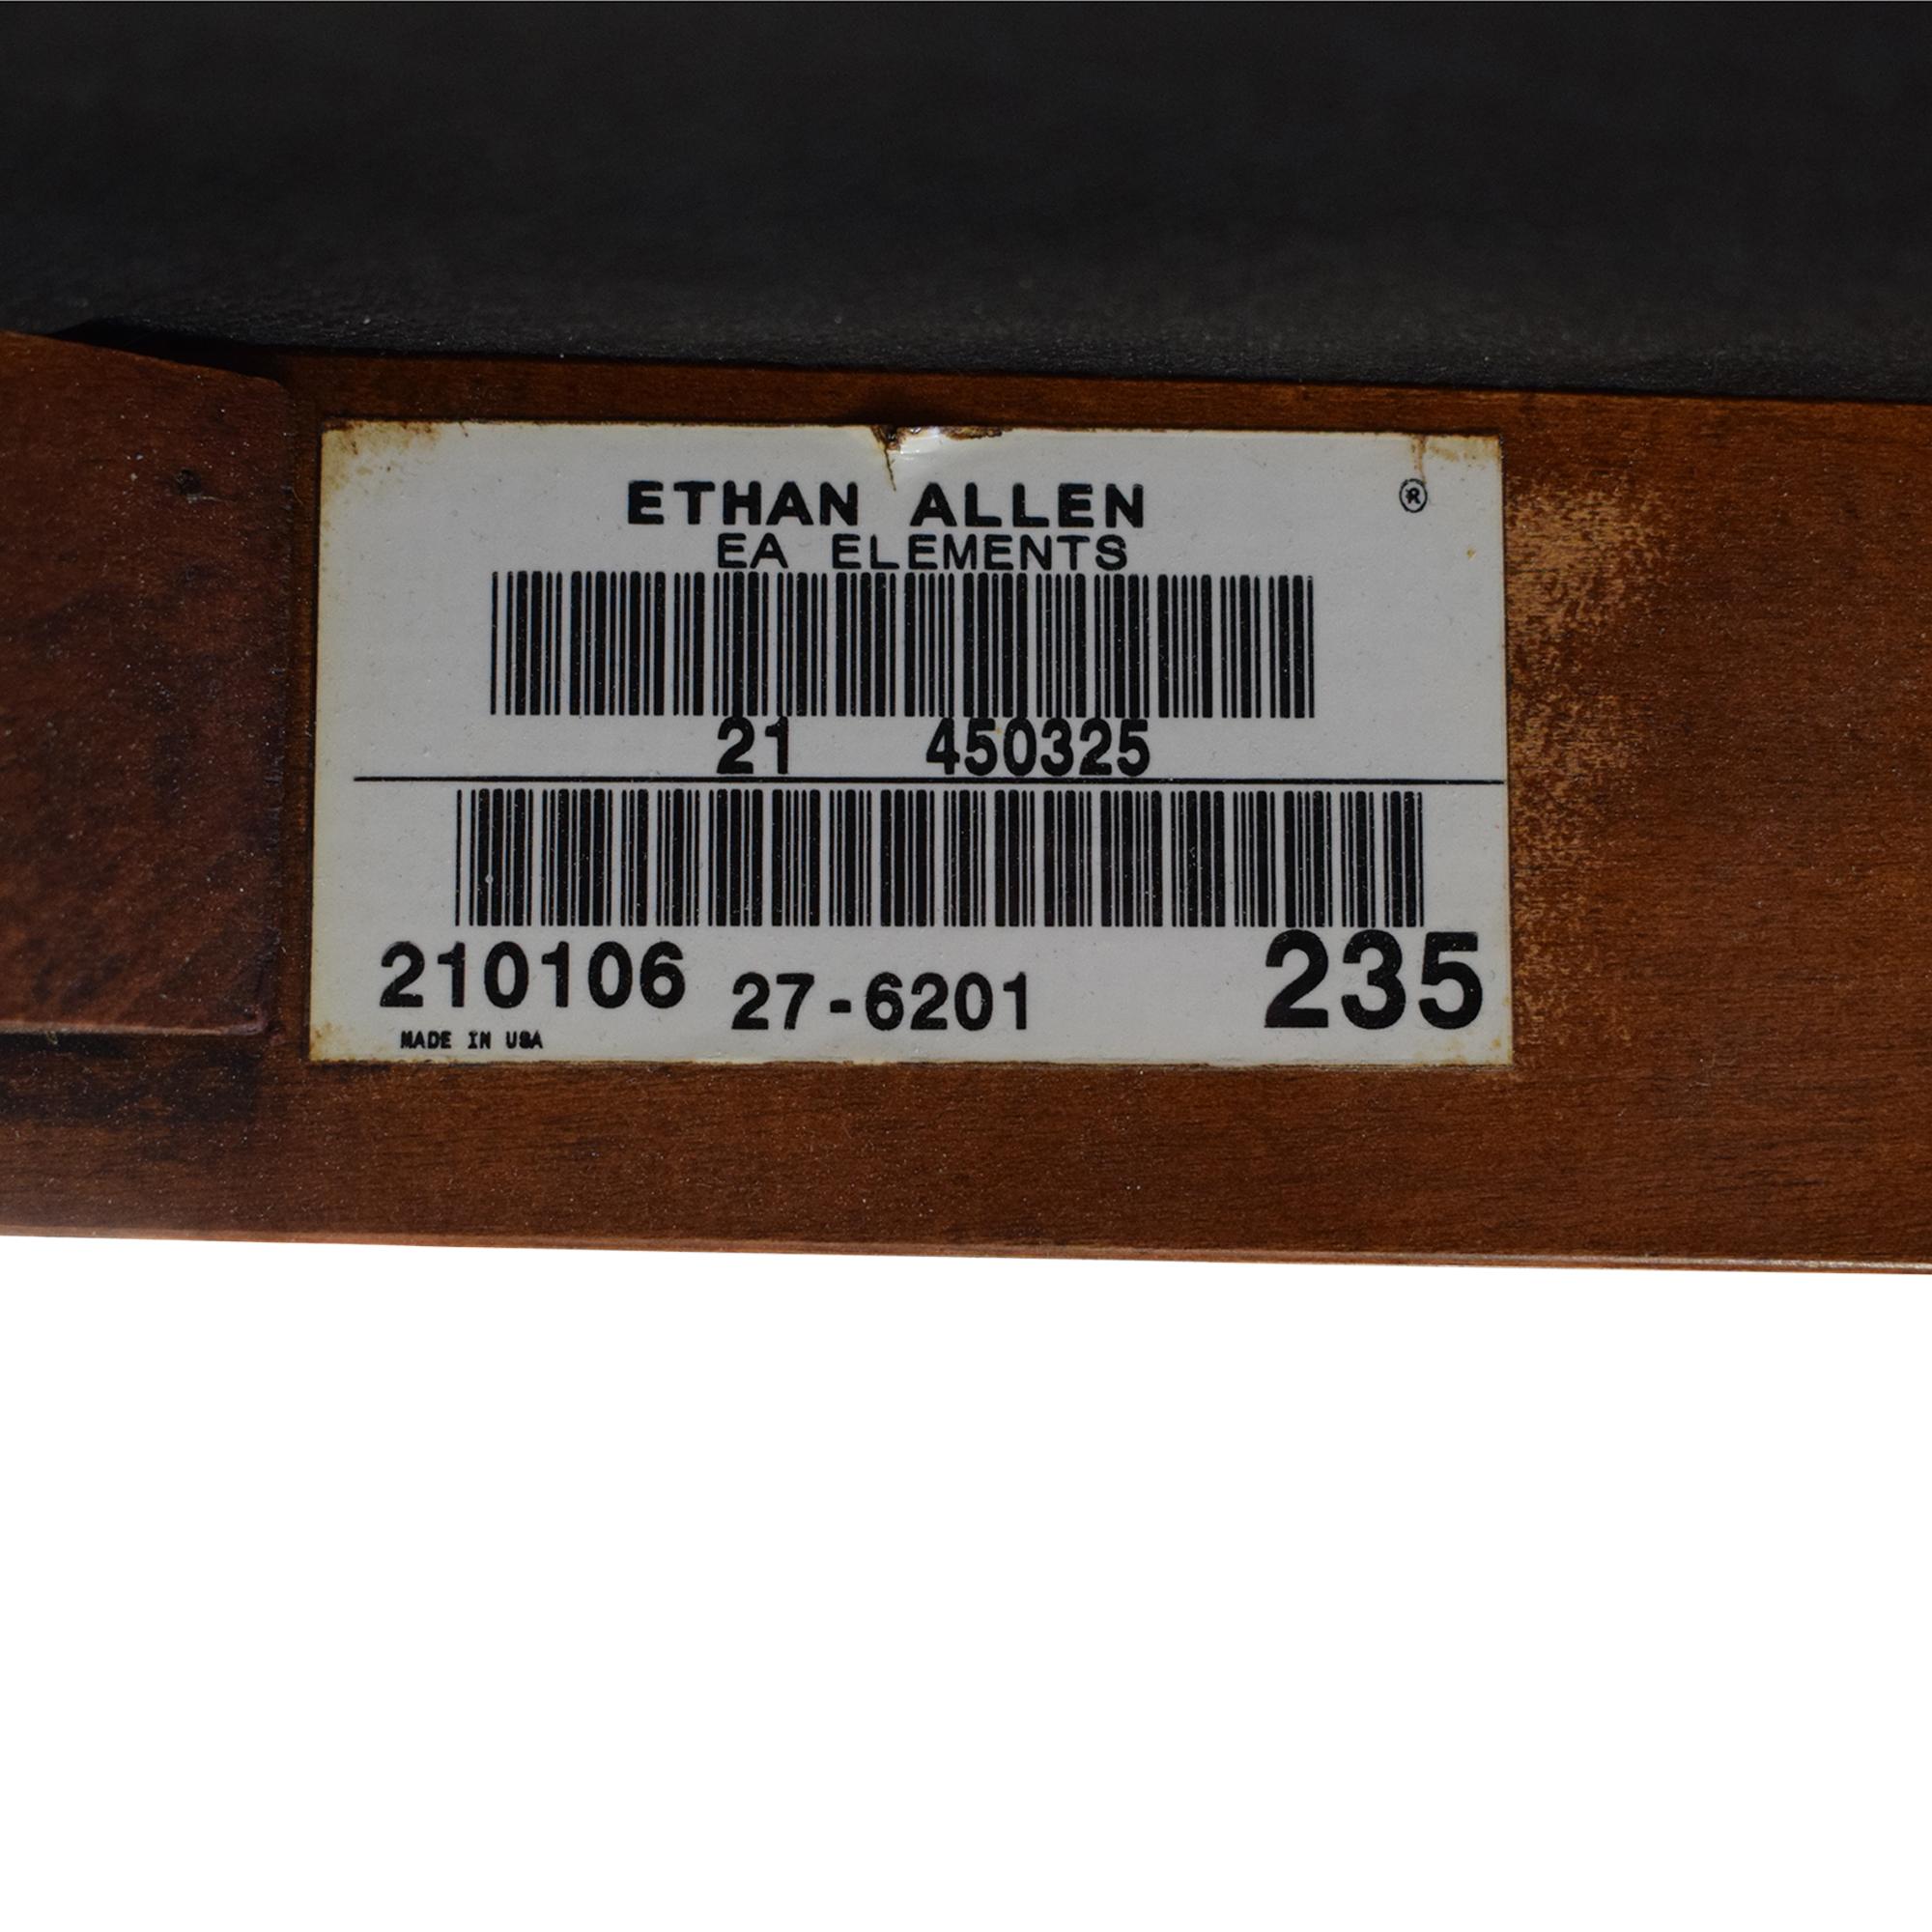 Ethan Allen Ethan Allen Dining Chairs